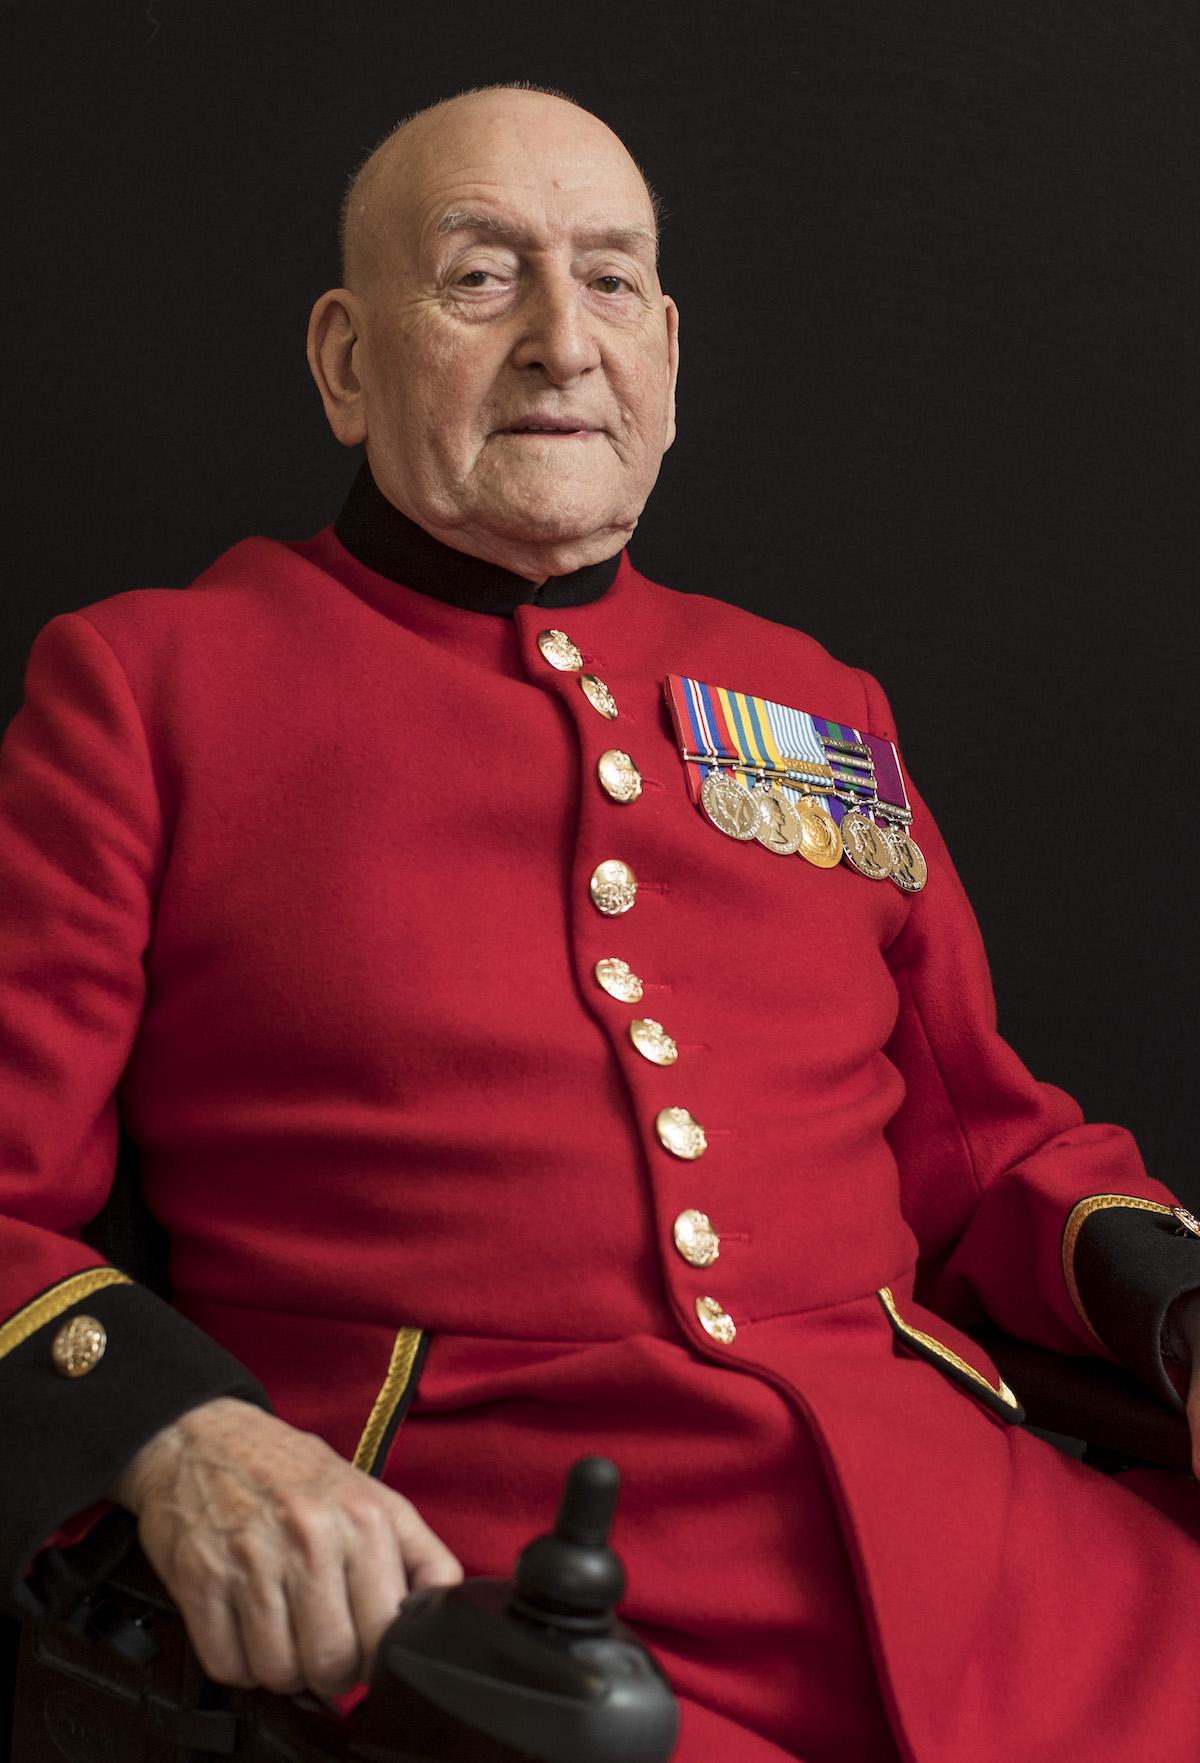 Alfred Mason - Chelsea Pensioner